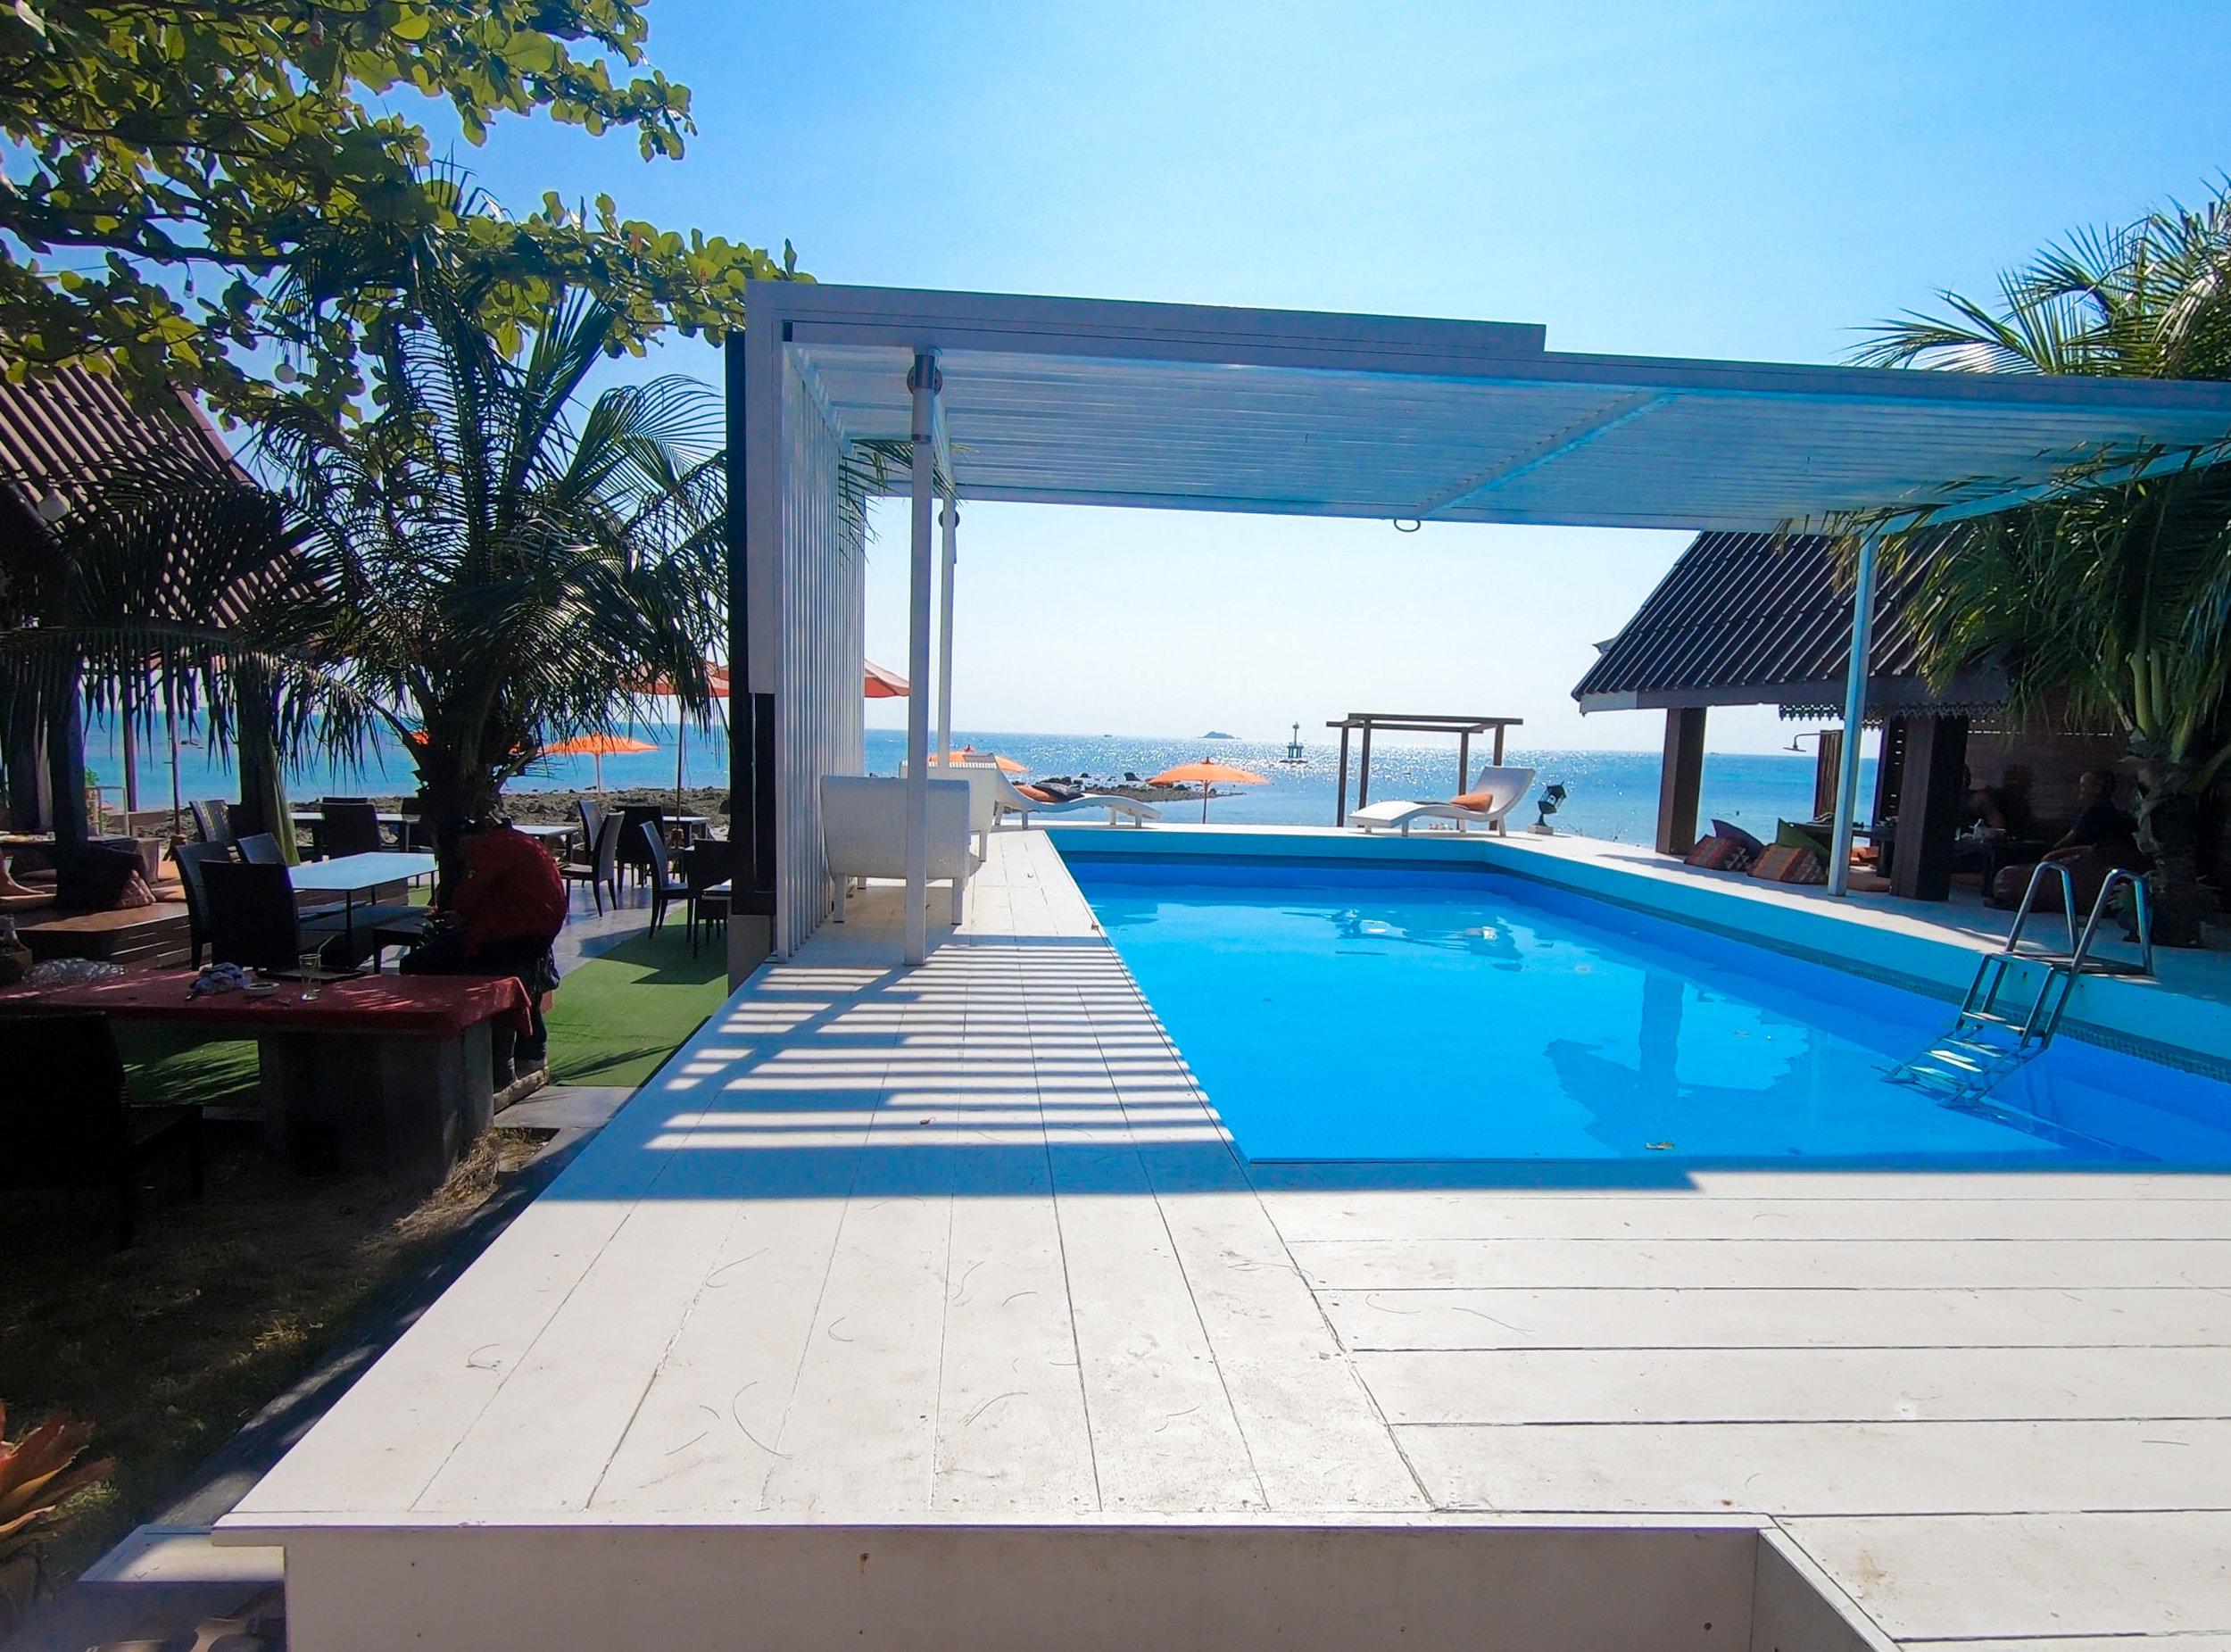 jungle-hooping-koh-pangan-thailand-resort-location_Numero seriale a 2 cifre_14.JPG